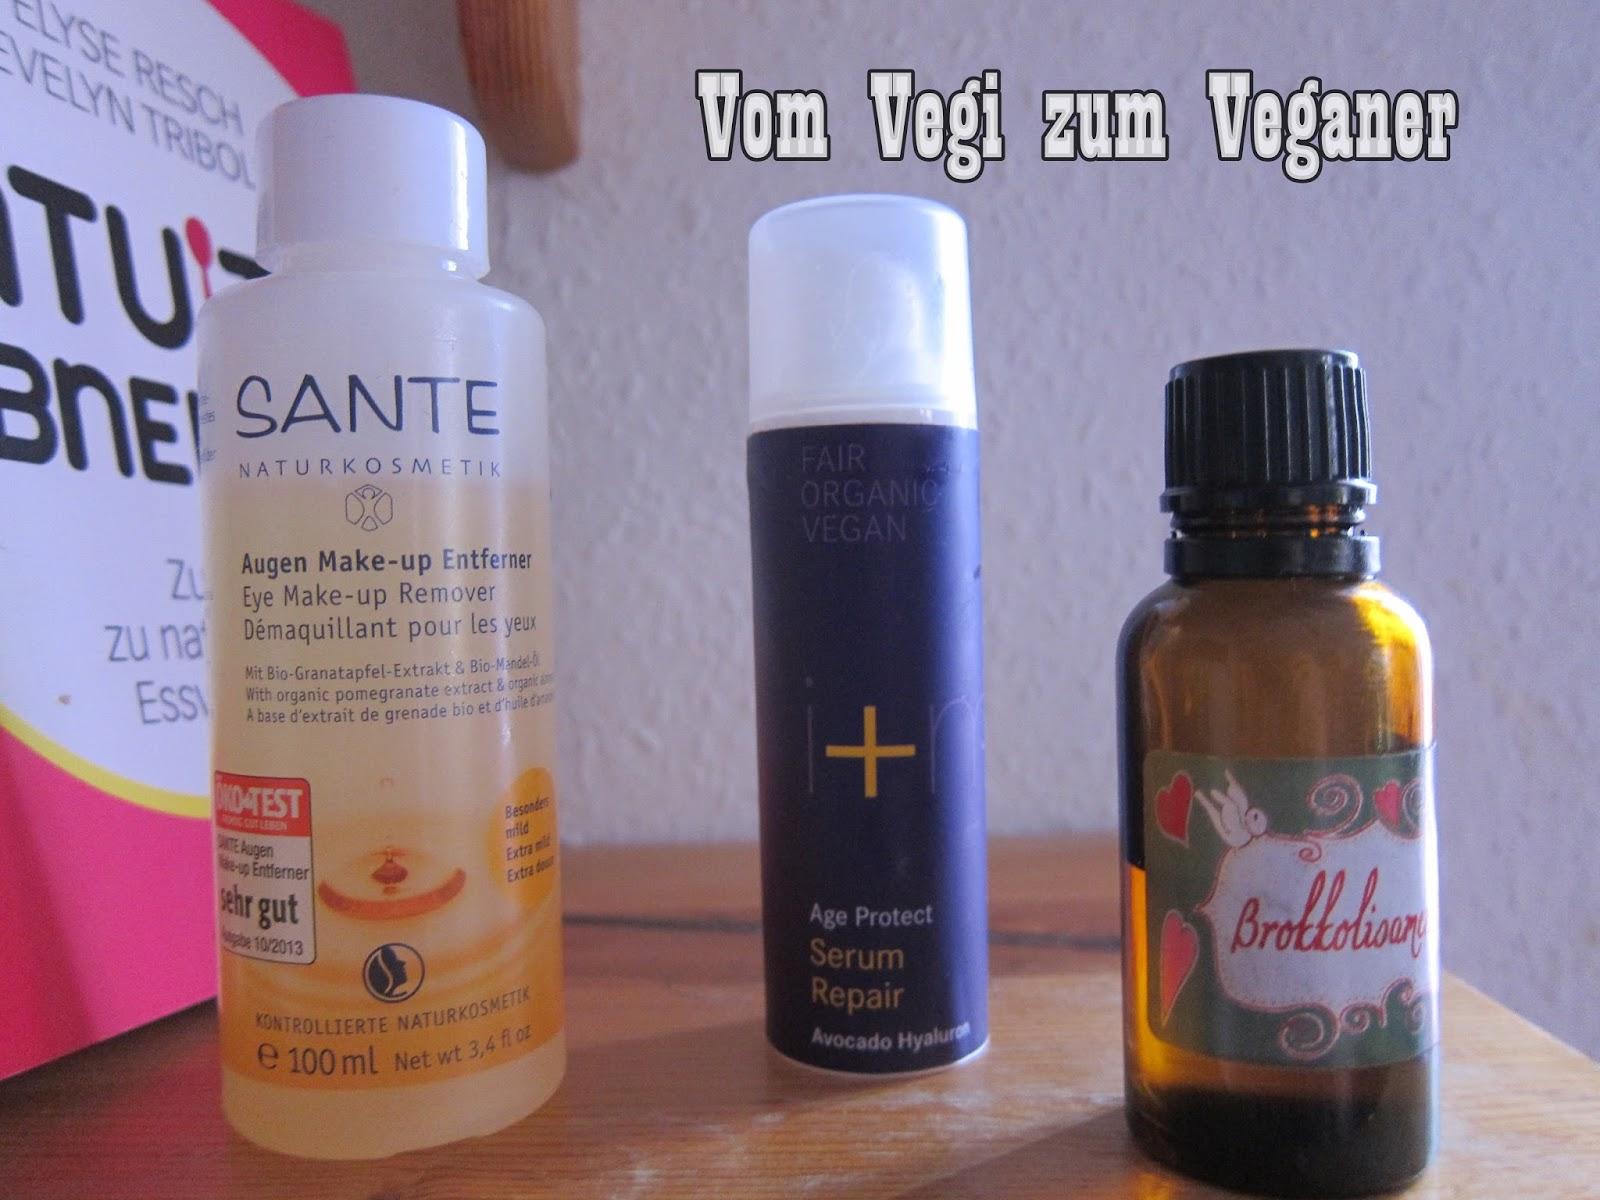 Vom Vegi Zum Veganer Dezember 2015